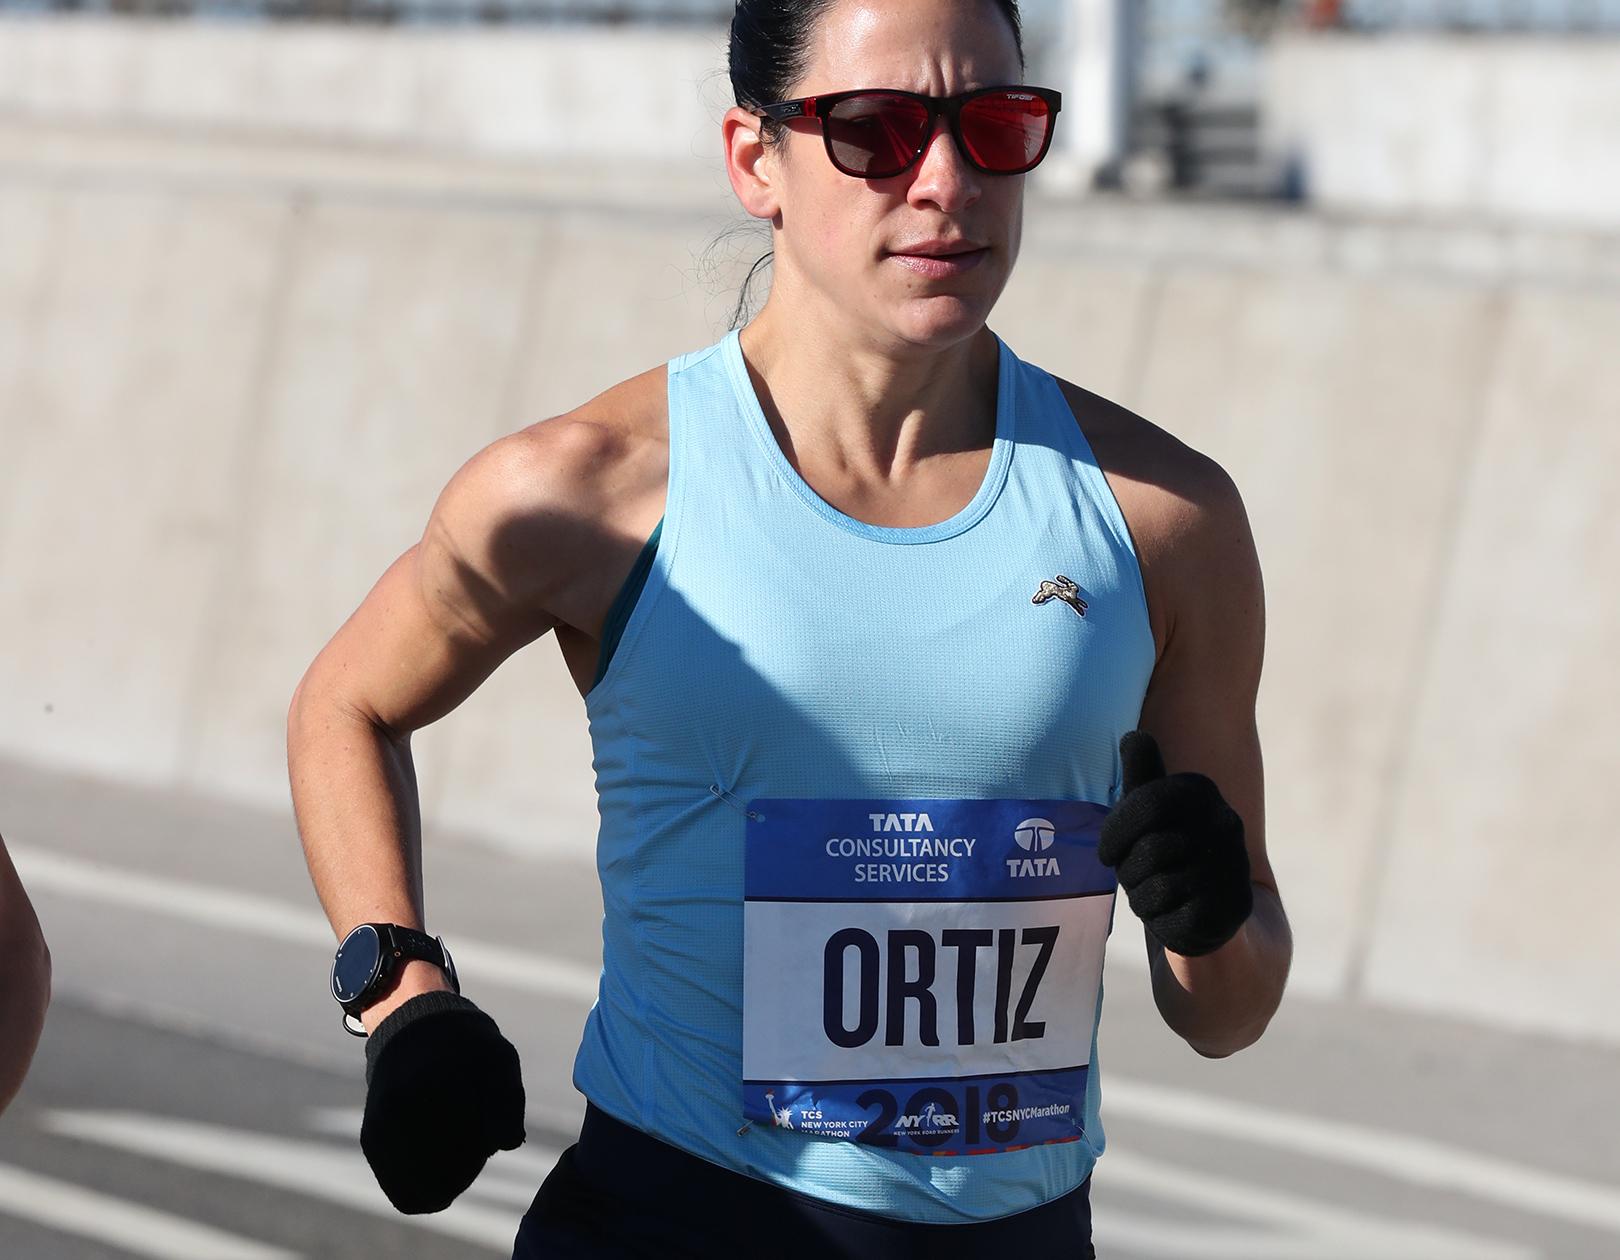 Angela Ortiz 2018 TCS New York City Marathon